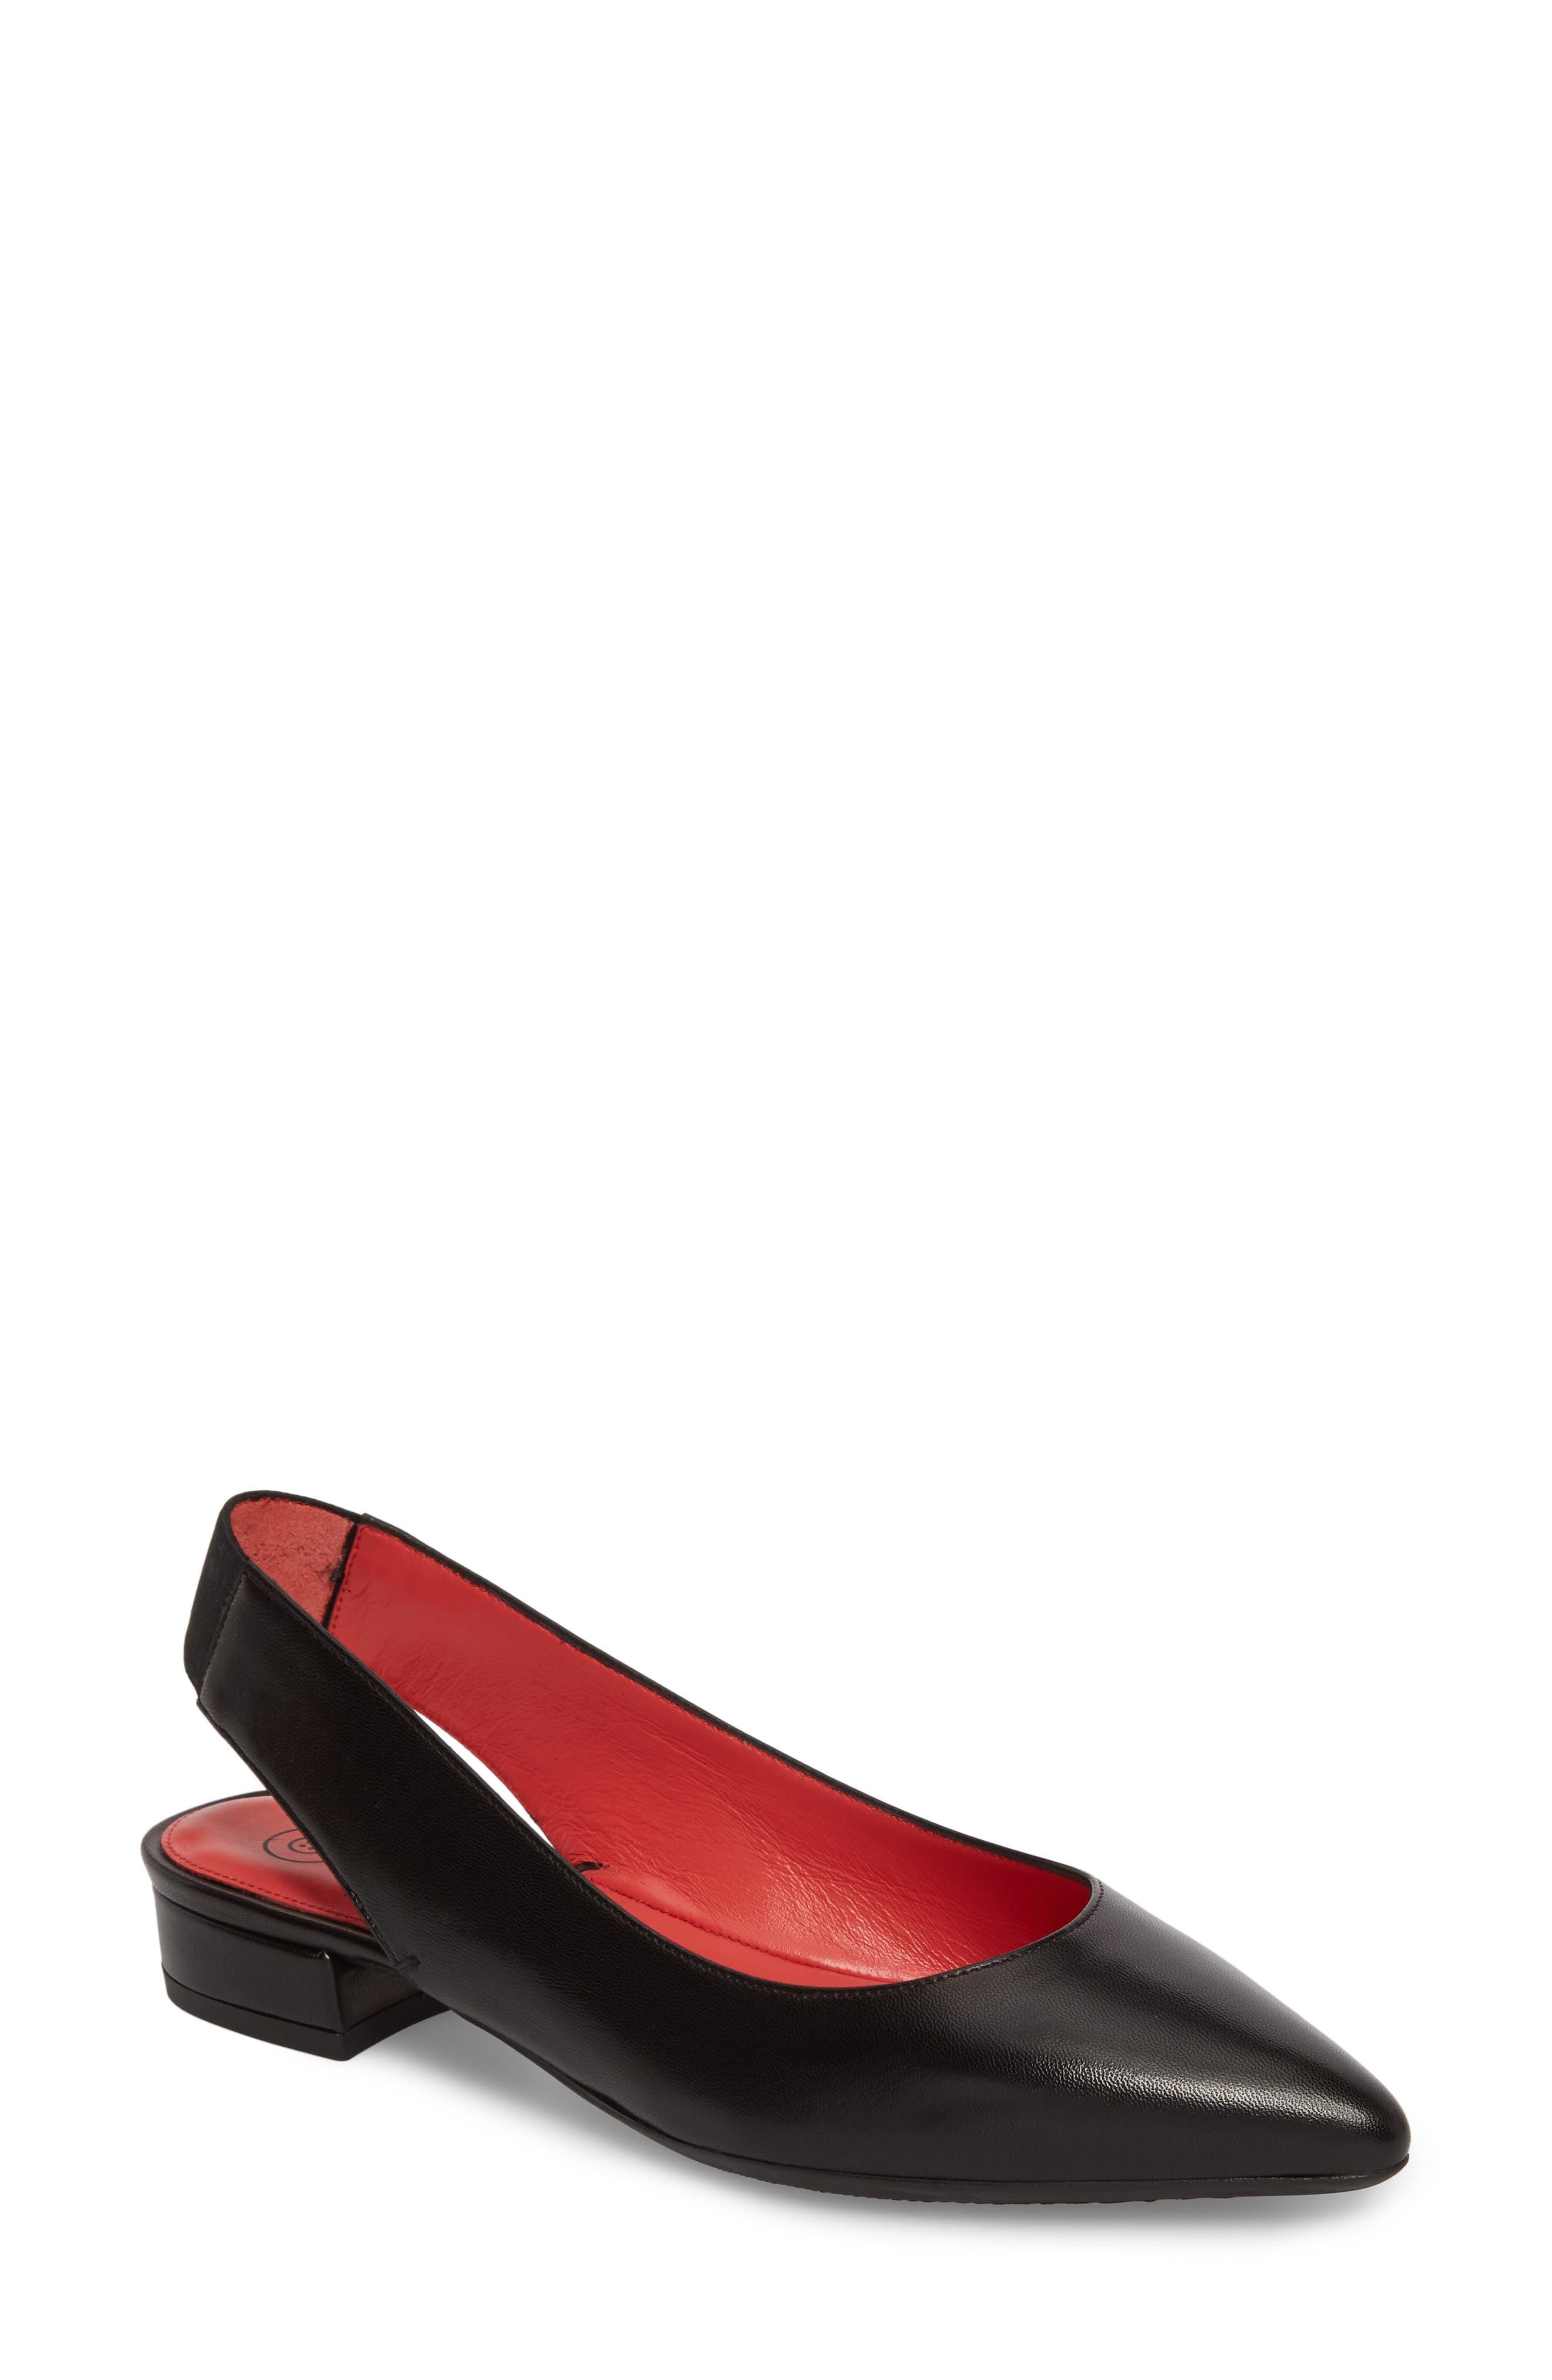 Janet Flat,                         Main,                         color, Black Leather